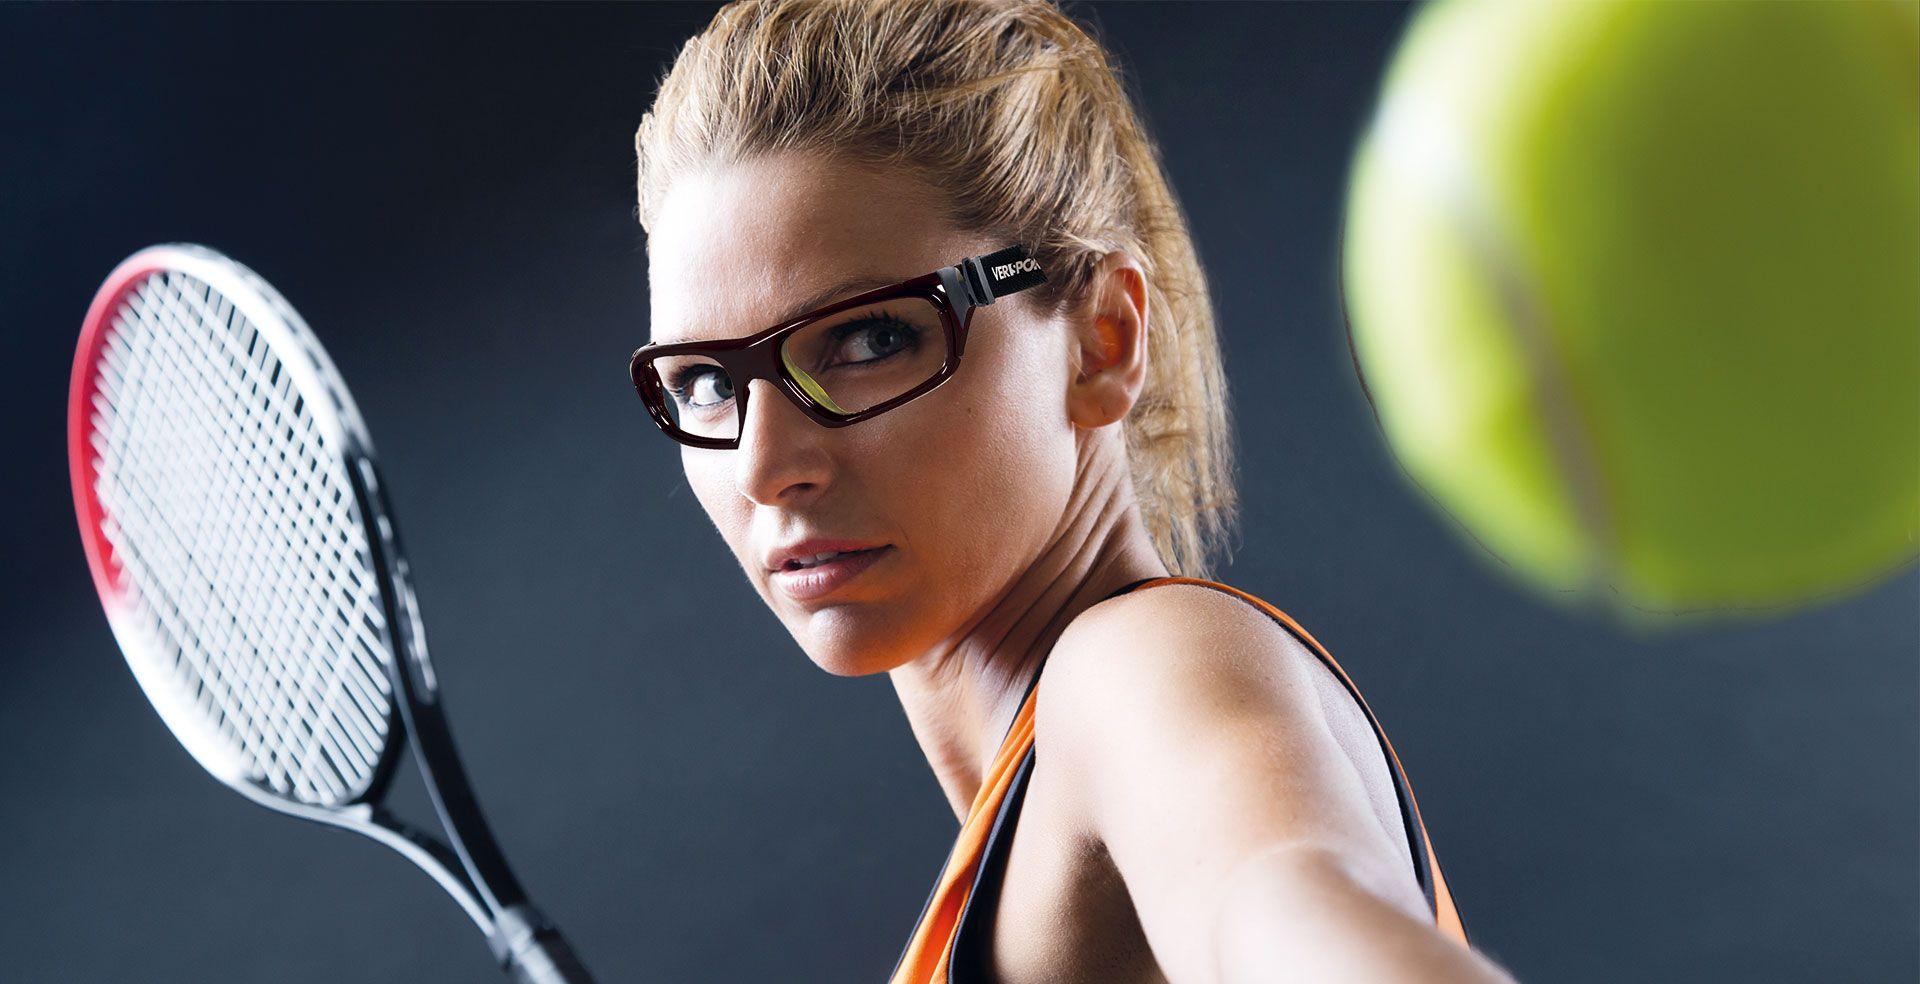 versport gafas deportivas graduadas